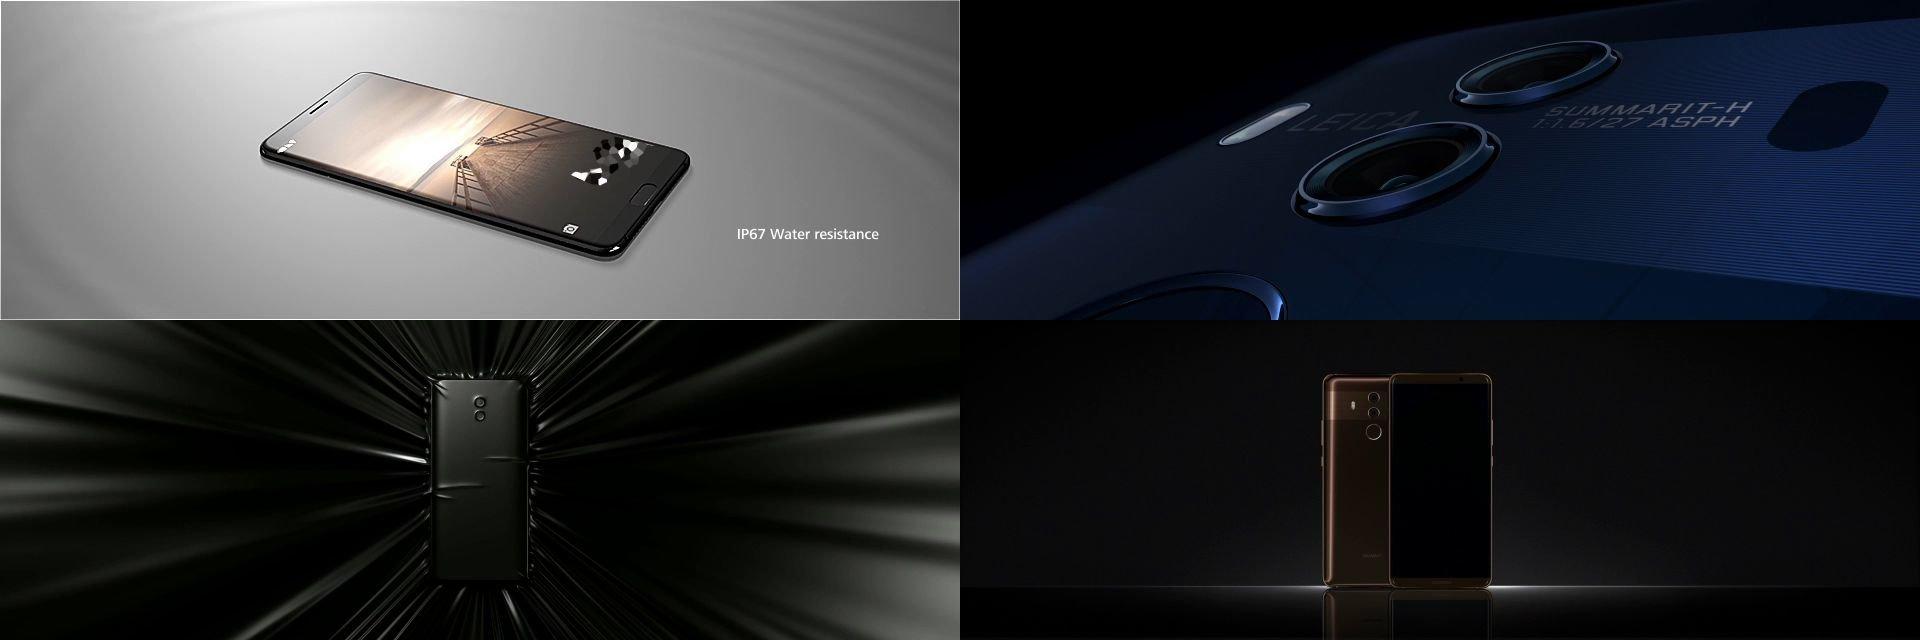 Huawei Mate 10: Οι πρώτες promo φωτογραφίες του με πολλές νέες λεπτομέρειες 1